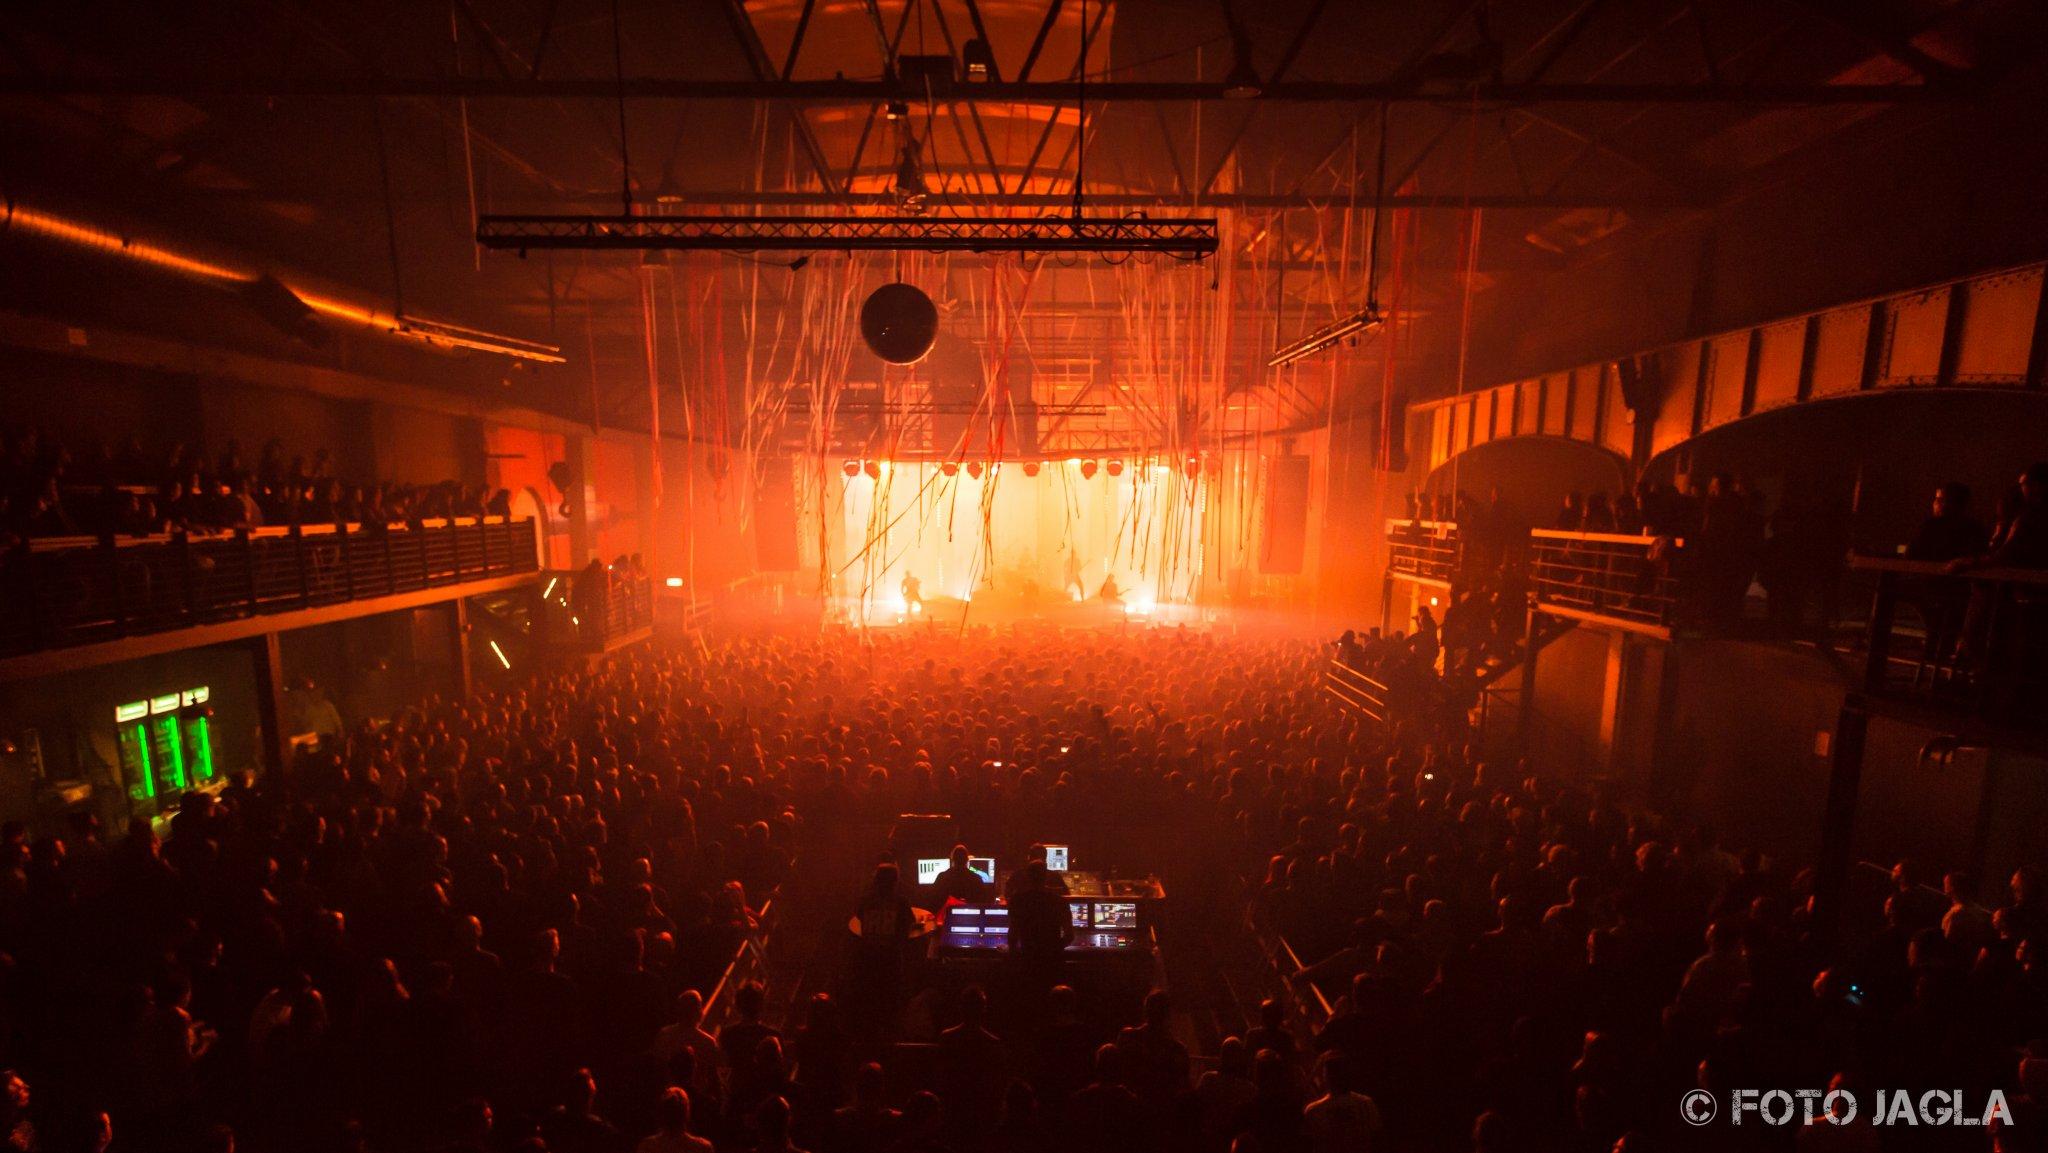 Parkway Drive Tour am 18.02.2016 in der Turbinenhalle Oberhausen